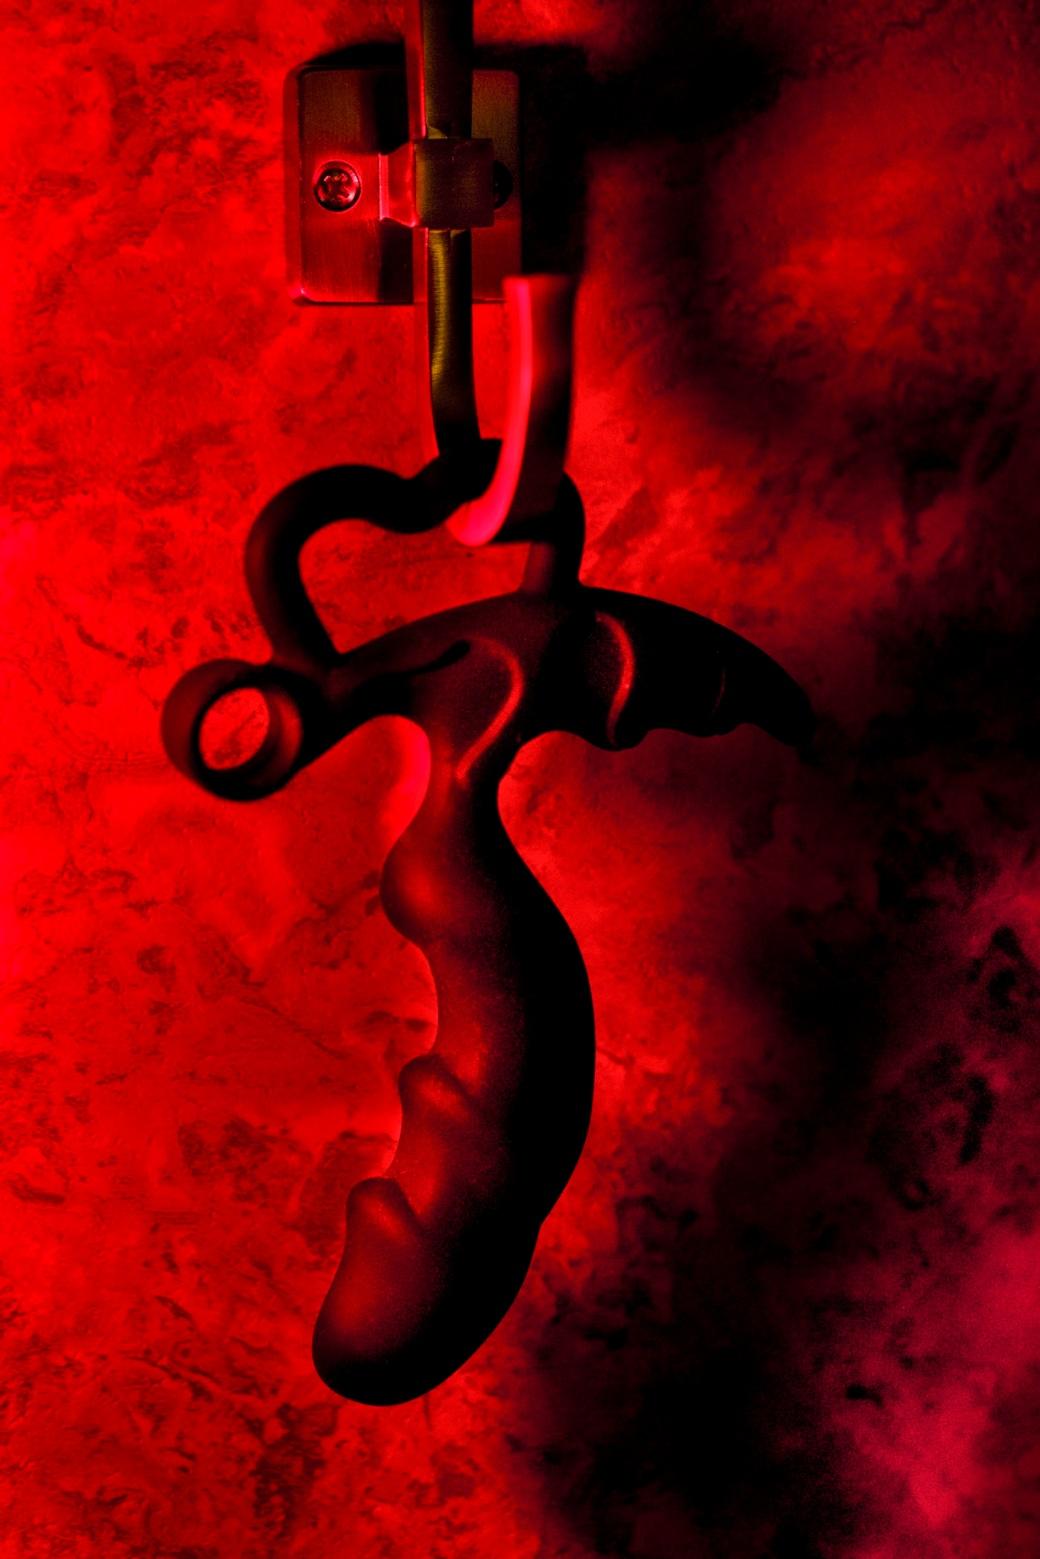 35 Sex Tool Copyright 2014 Daniel D. Teoli Jr. mr